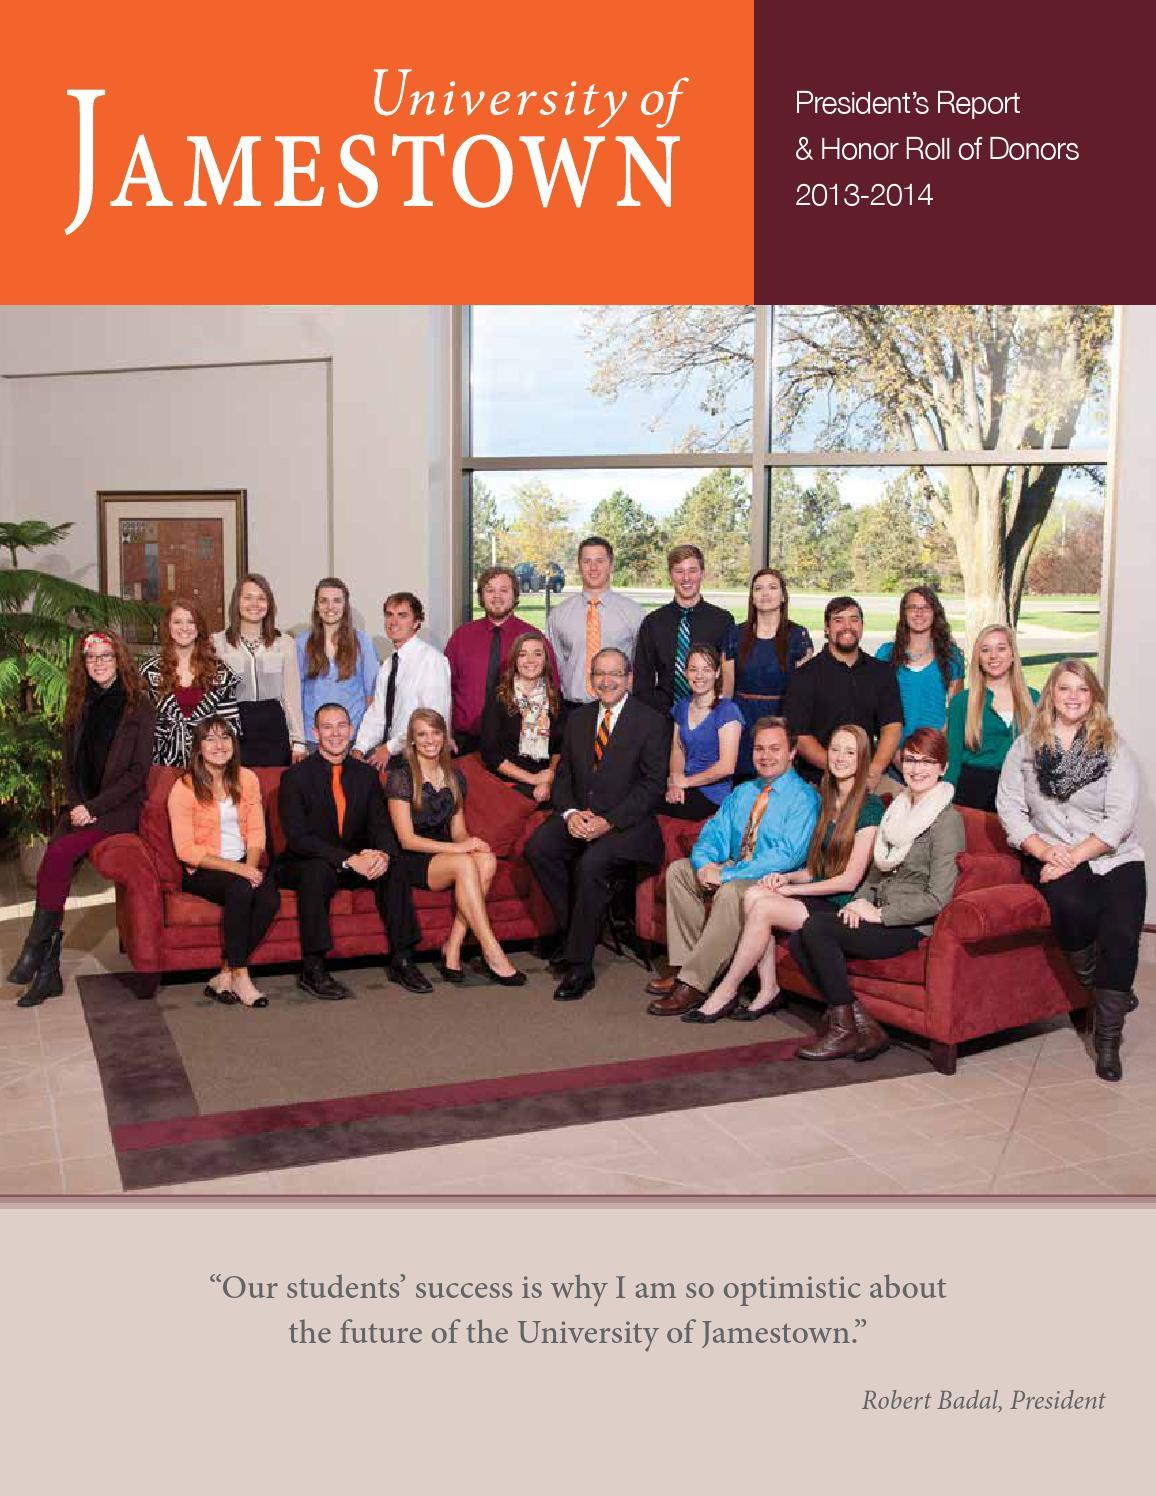 University Of Jamestown President S Report 2013 2014 By